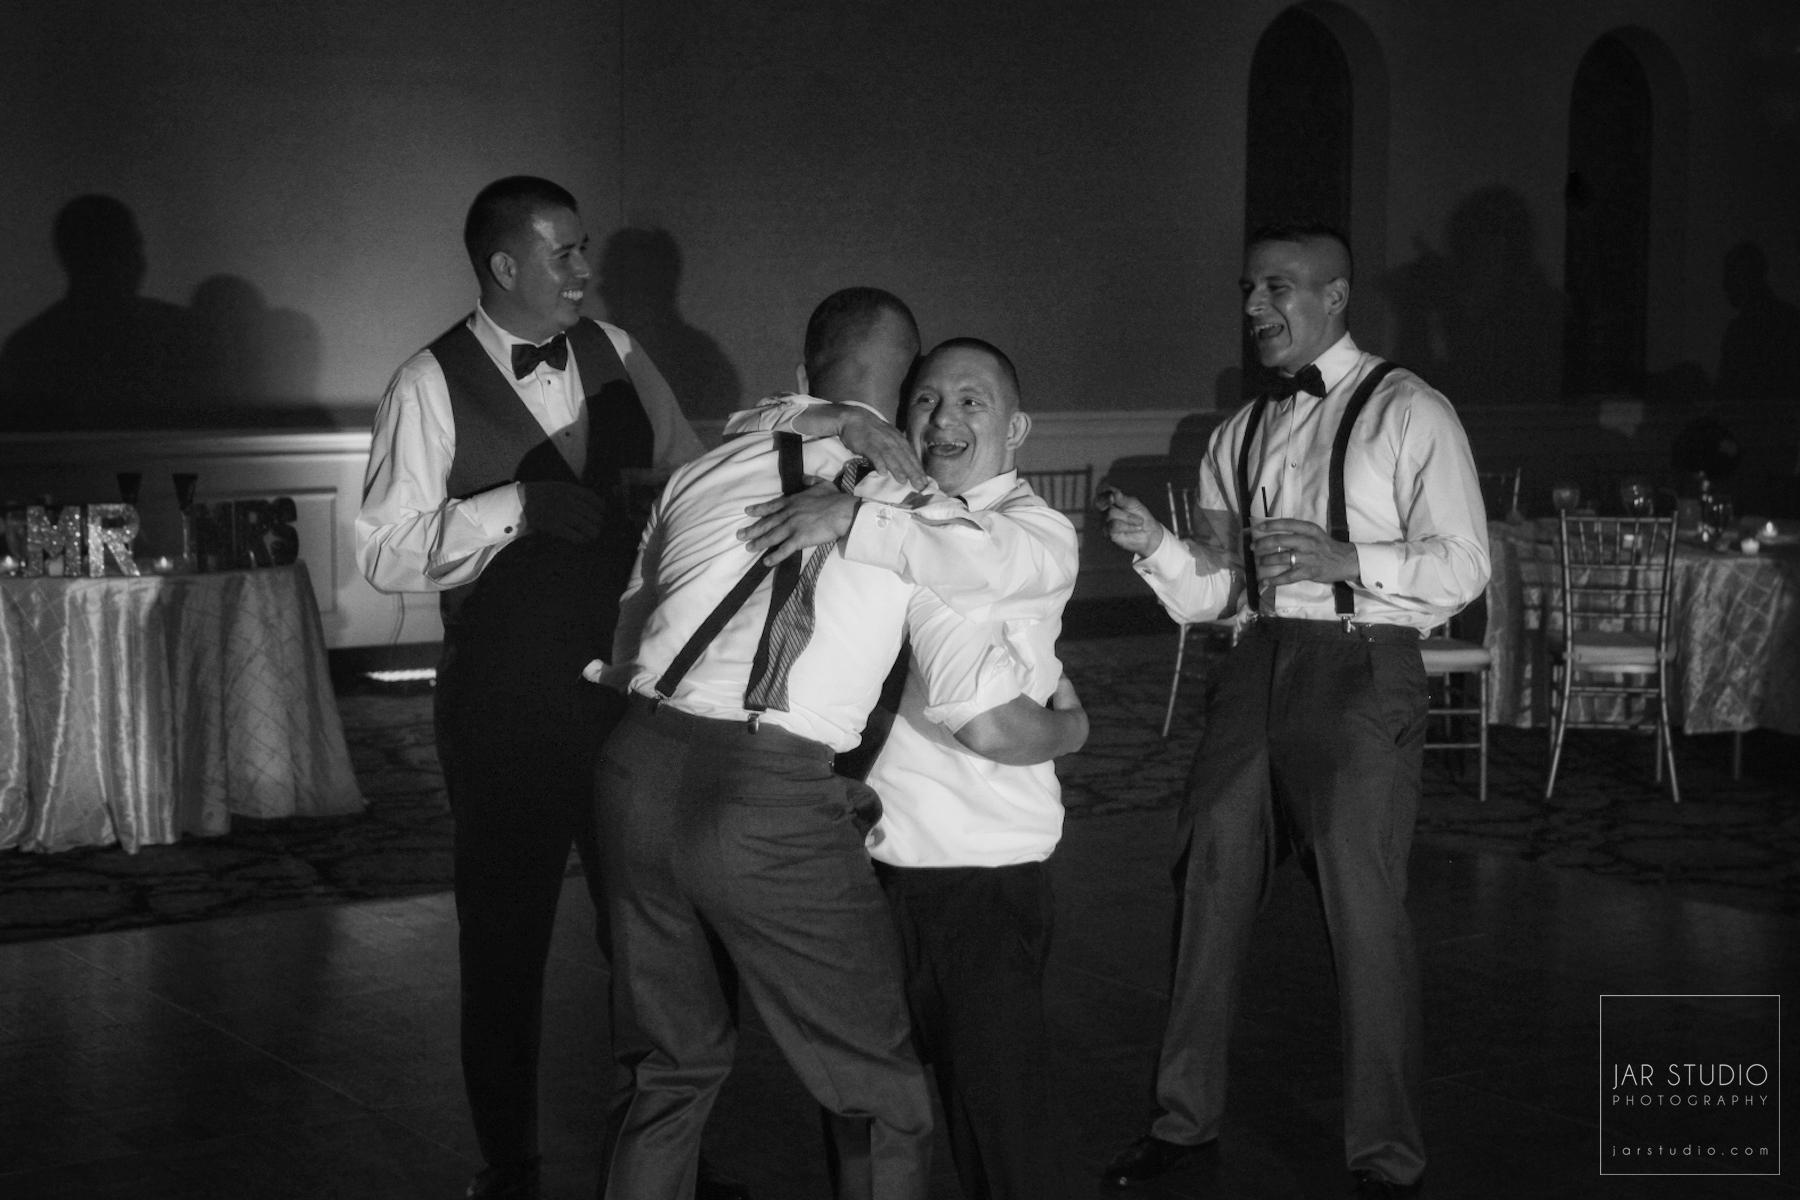 29-groom-groomsmen-party-fun-orlando-photographer-weddings.JPG